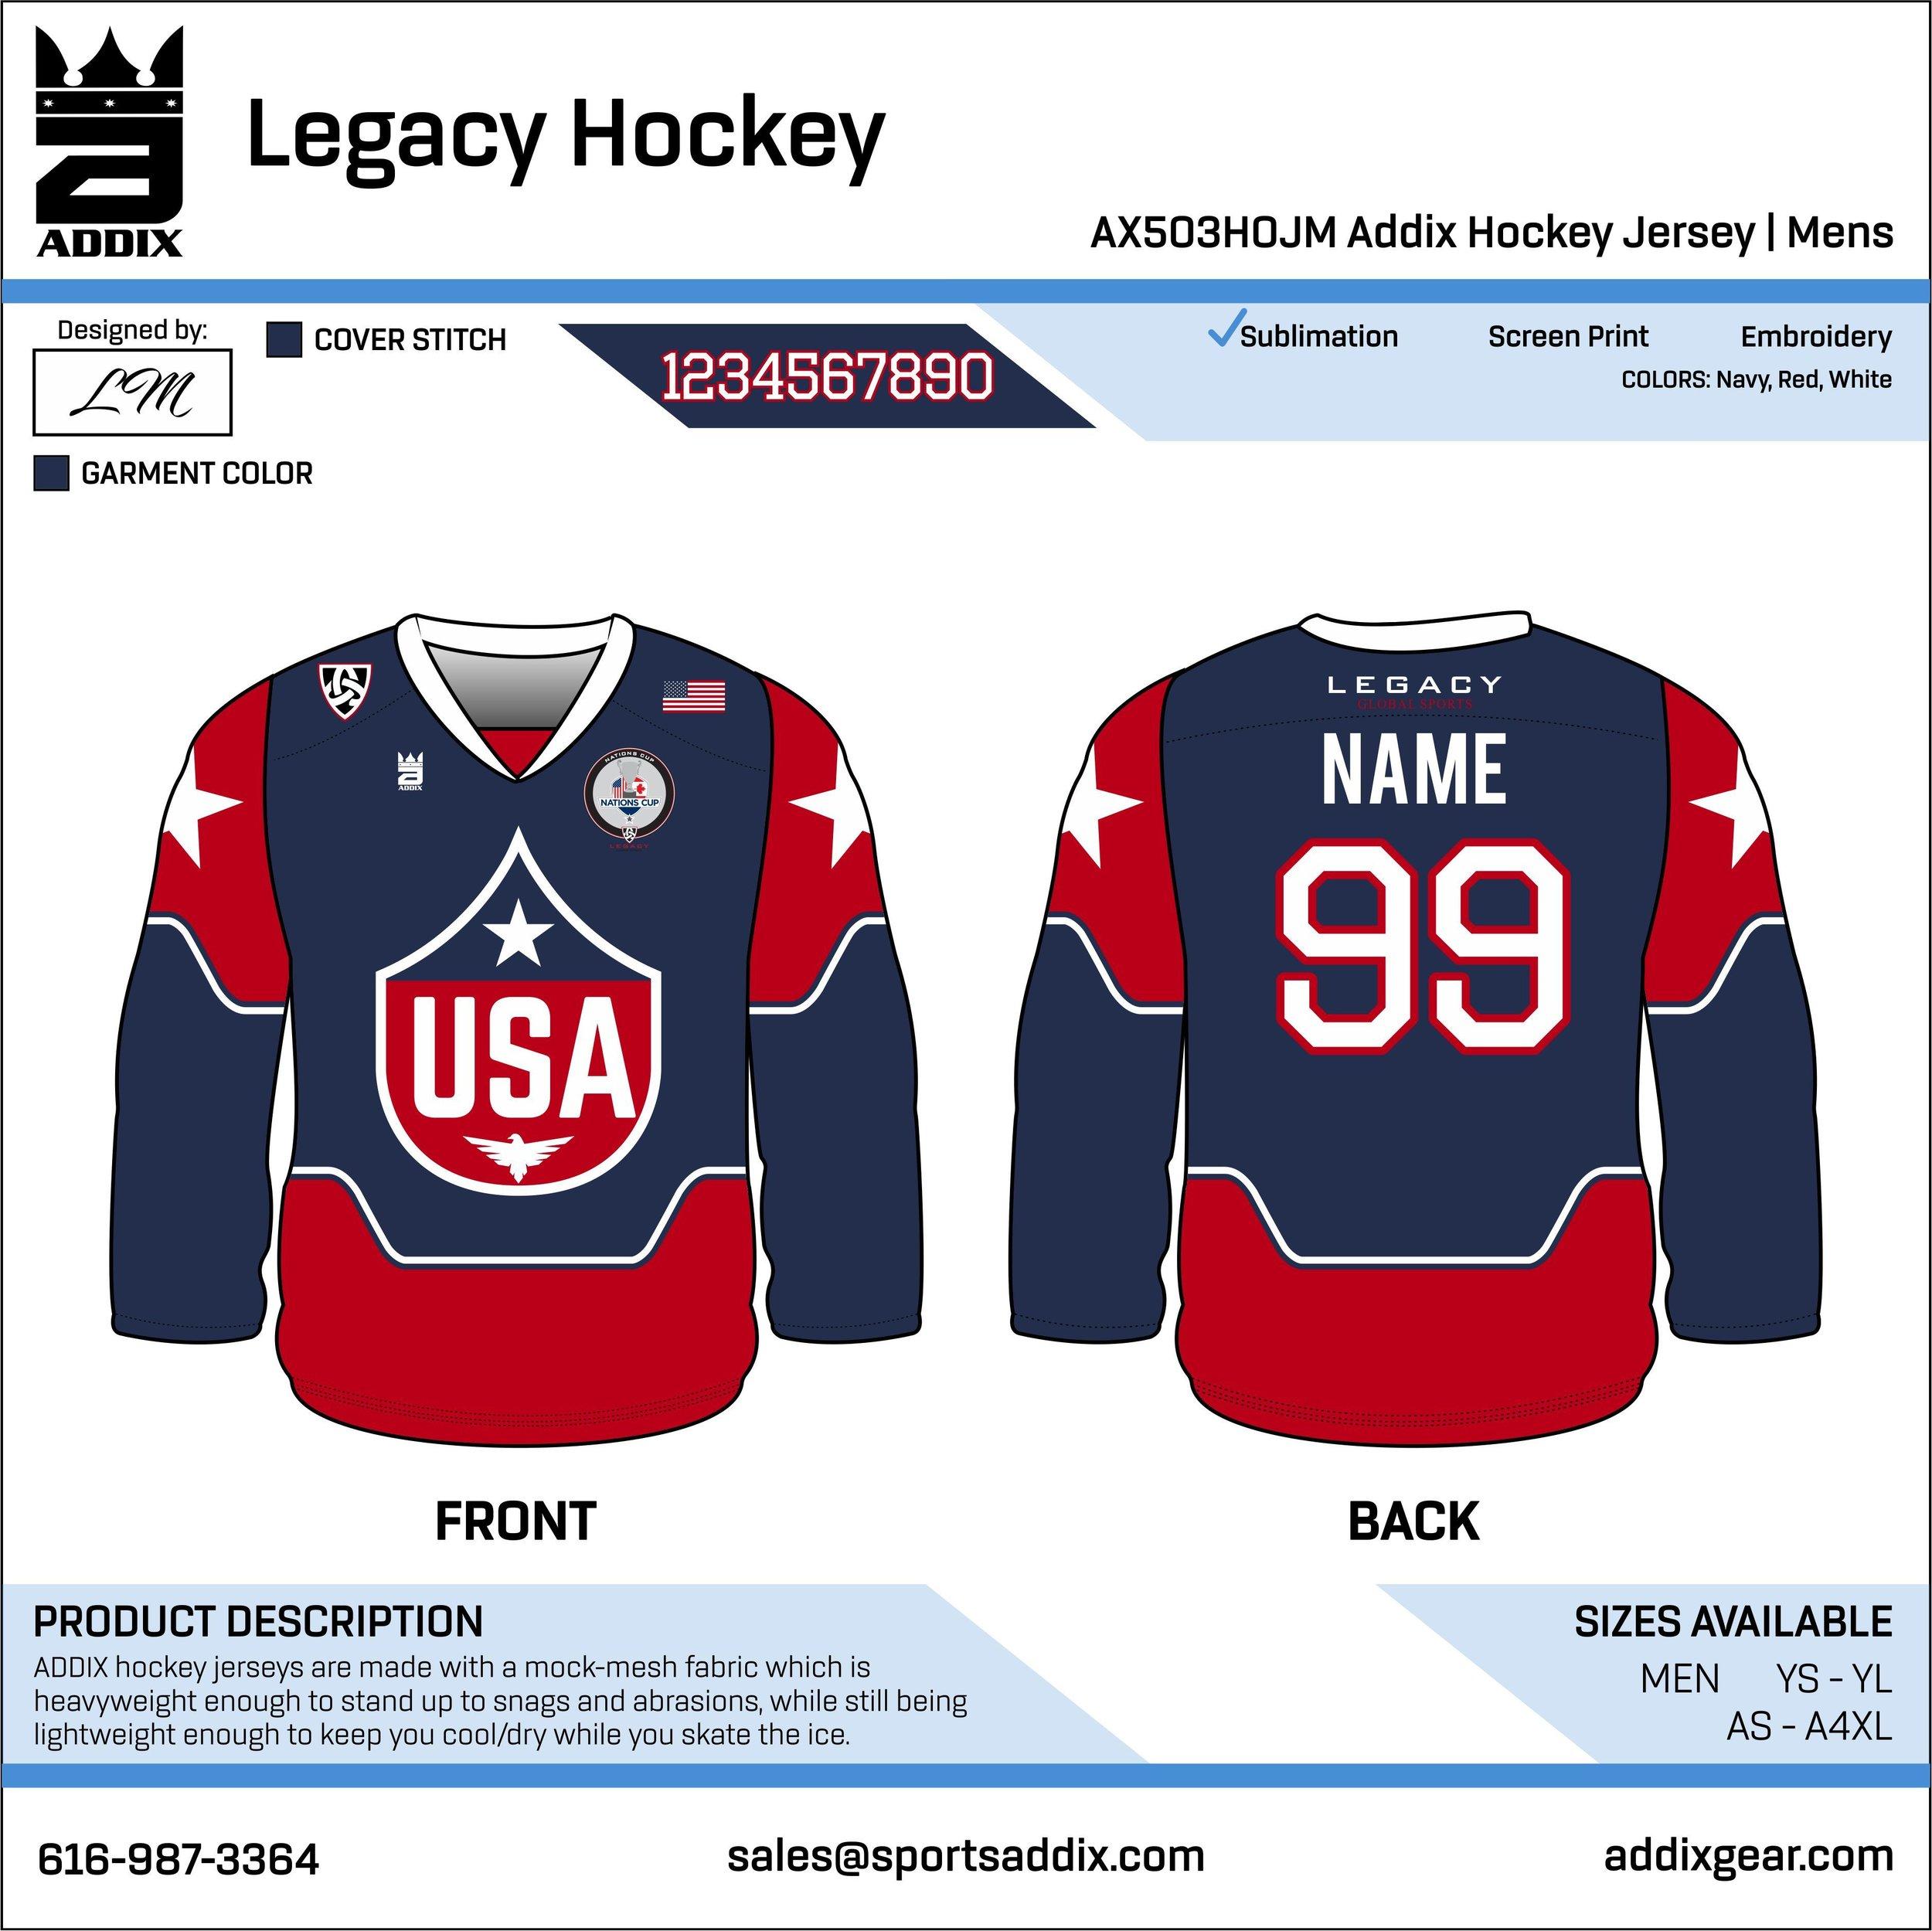 Legacy Hockey_2019_3-29_LM_hockey jersey_usa.jpg